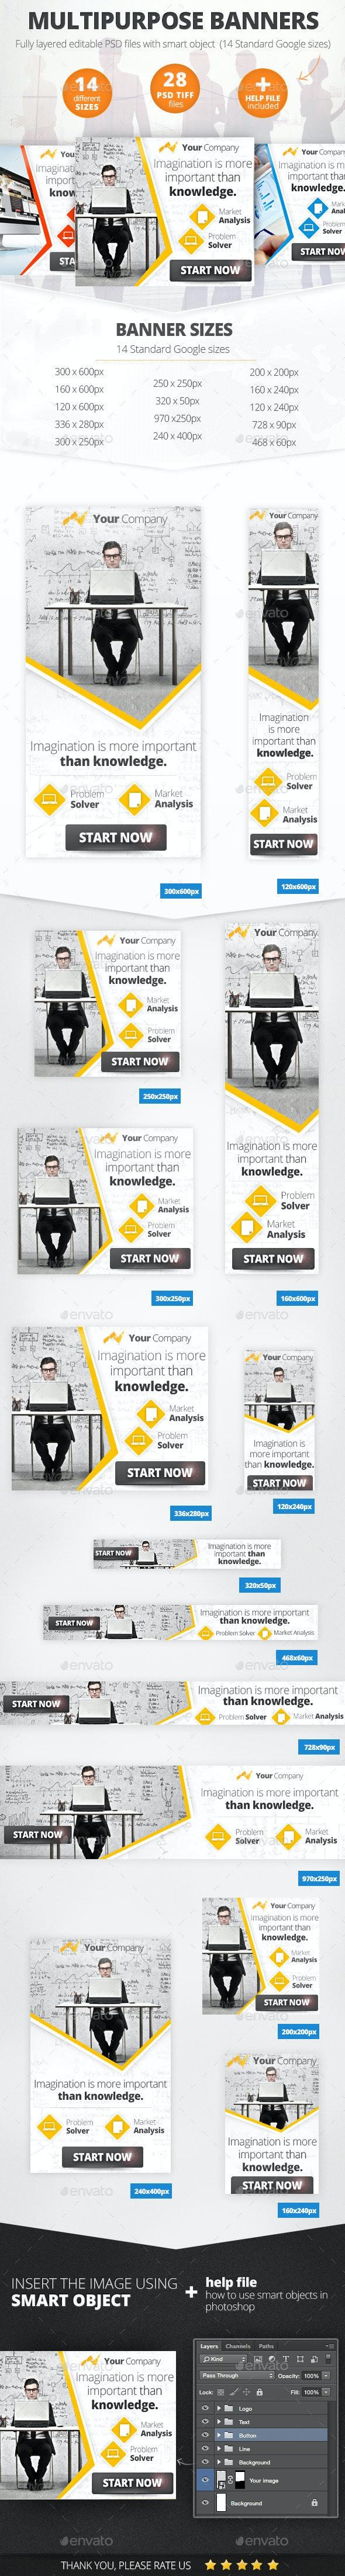 Multipurpose Marketing Web Banners  - Banners & Ads Web Elements